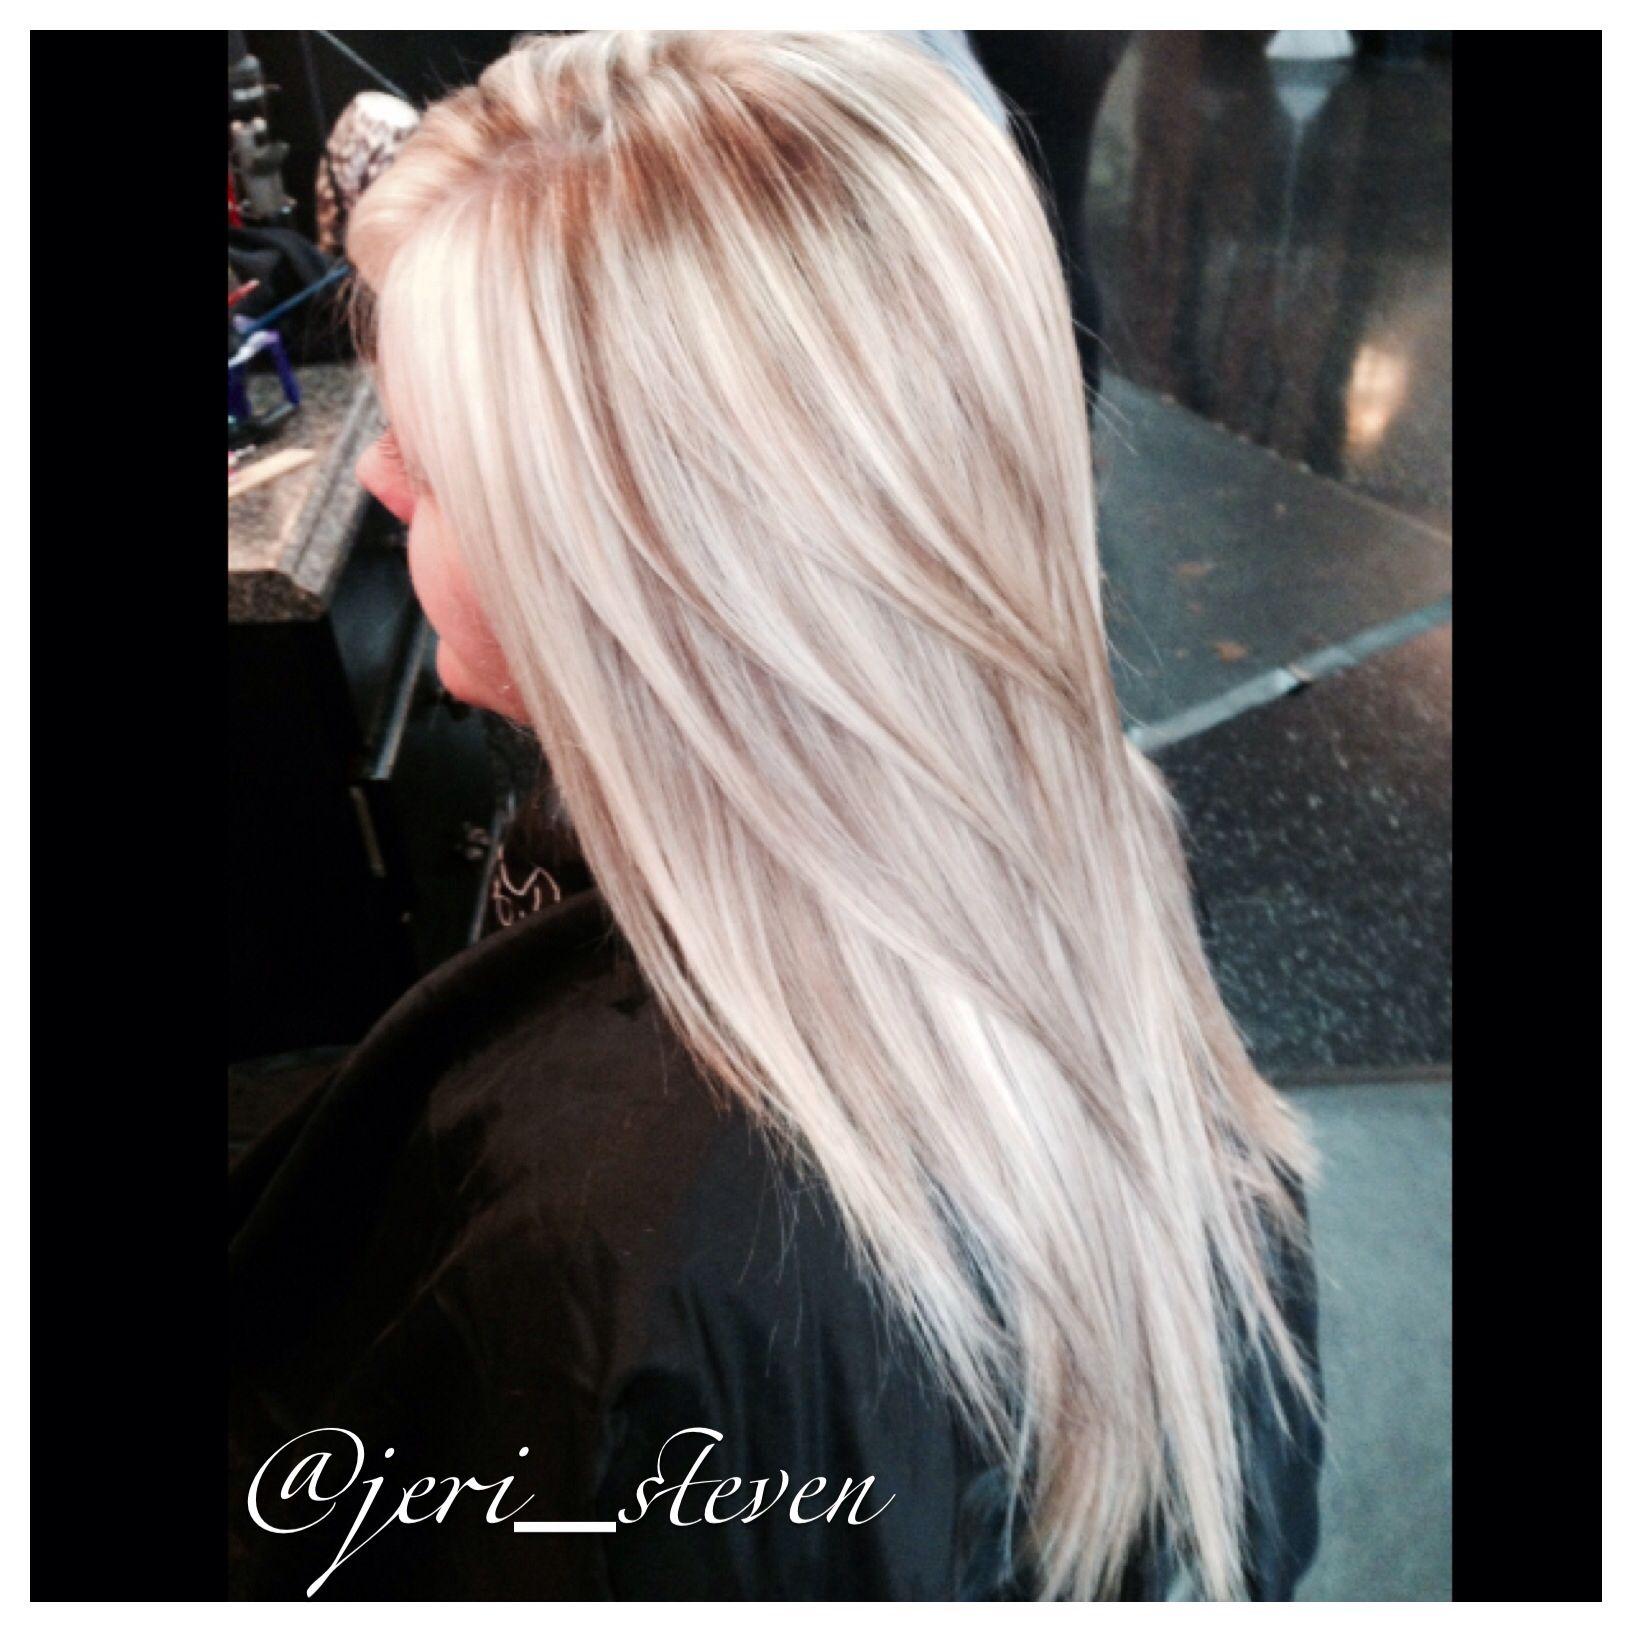 I Want Blonde Blonde Hair With Light Carmel Cream Highlights